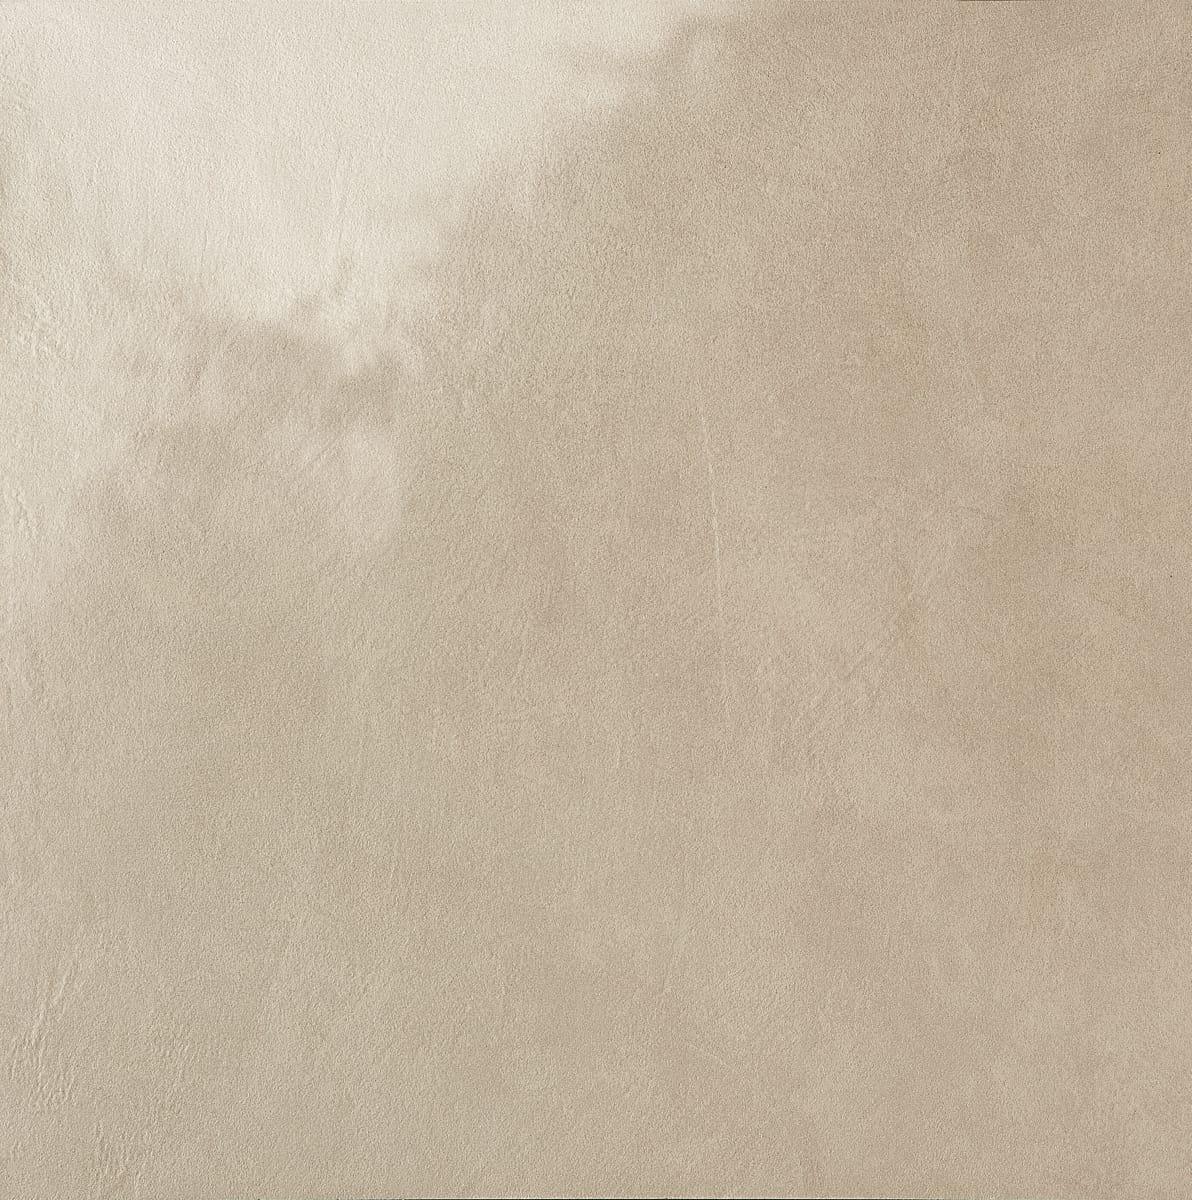 Mlkq international ceramics for Carrelage 60x60 beige